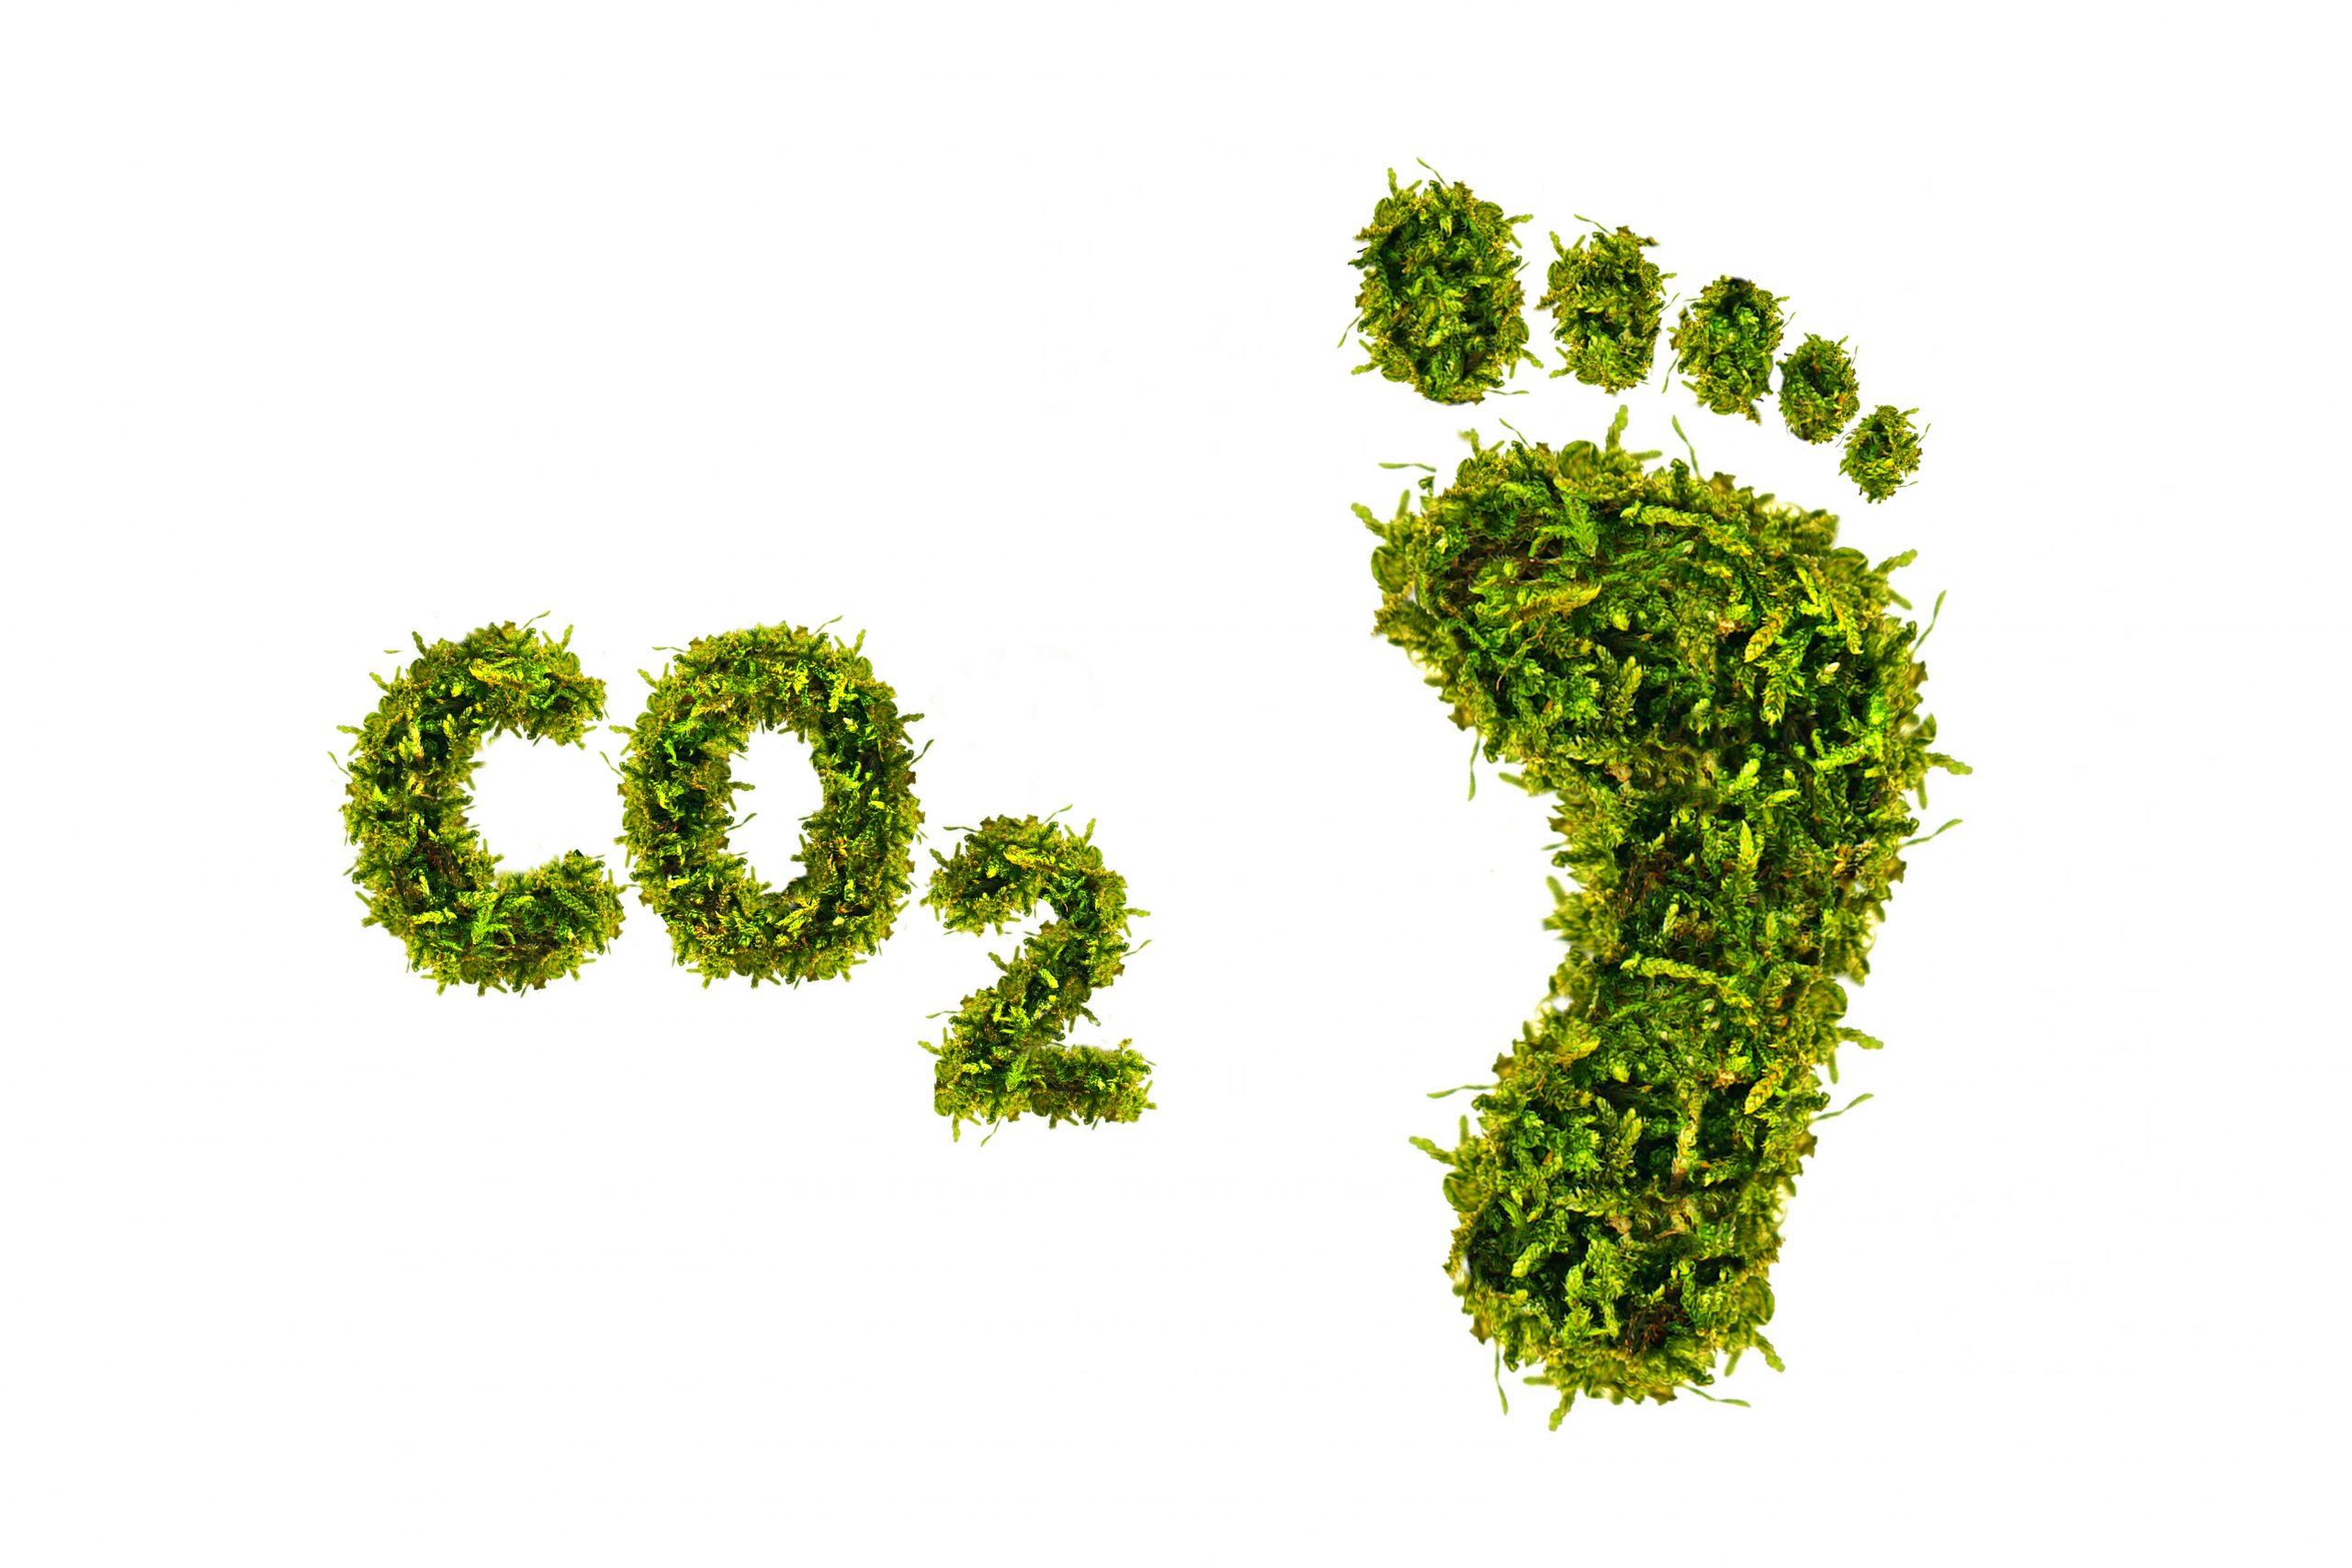 Innovationsbündnis für geringeren CO2 Fußabdruck